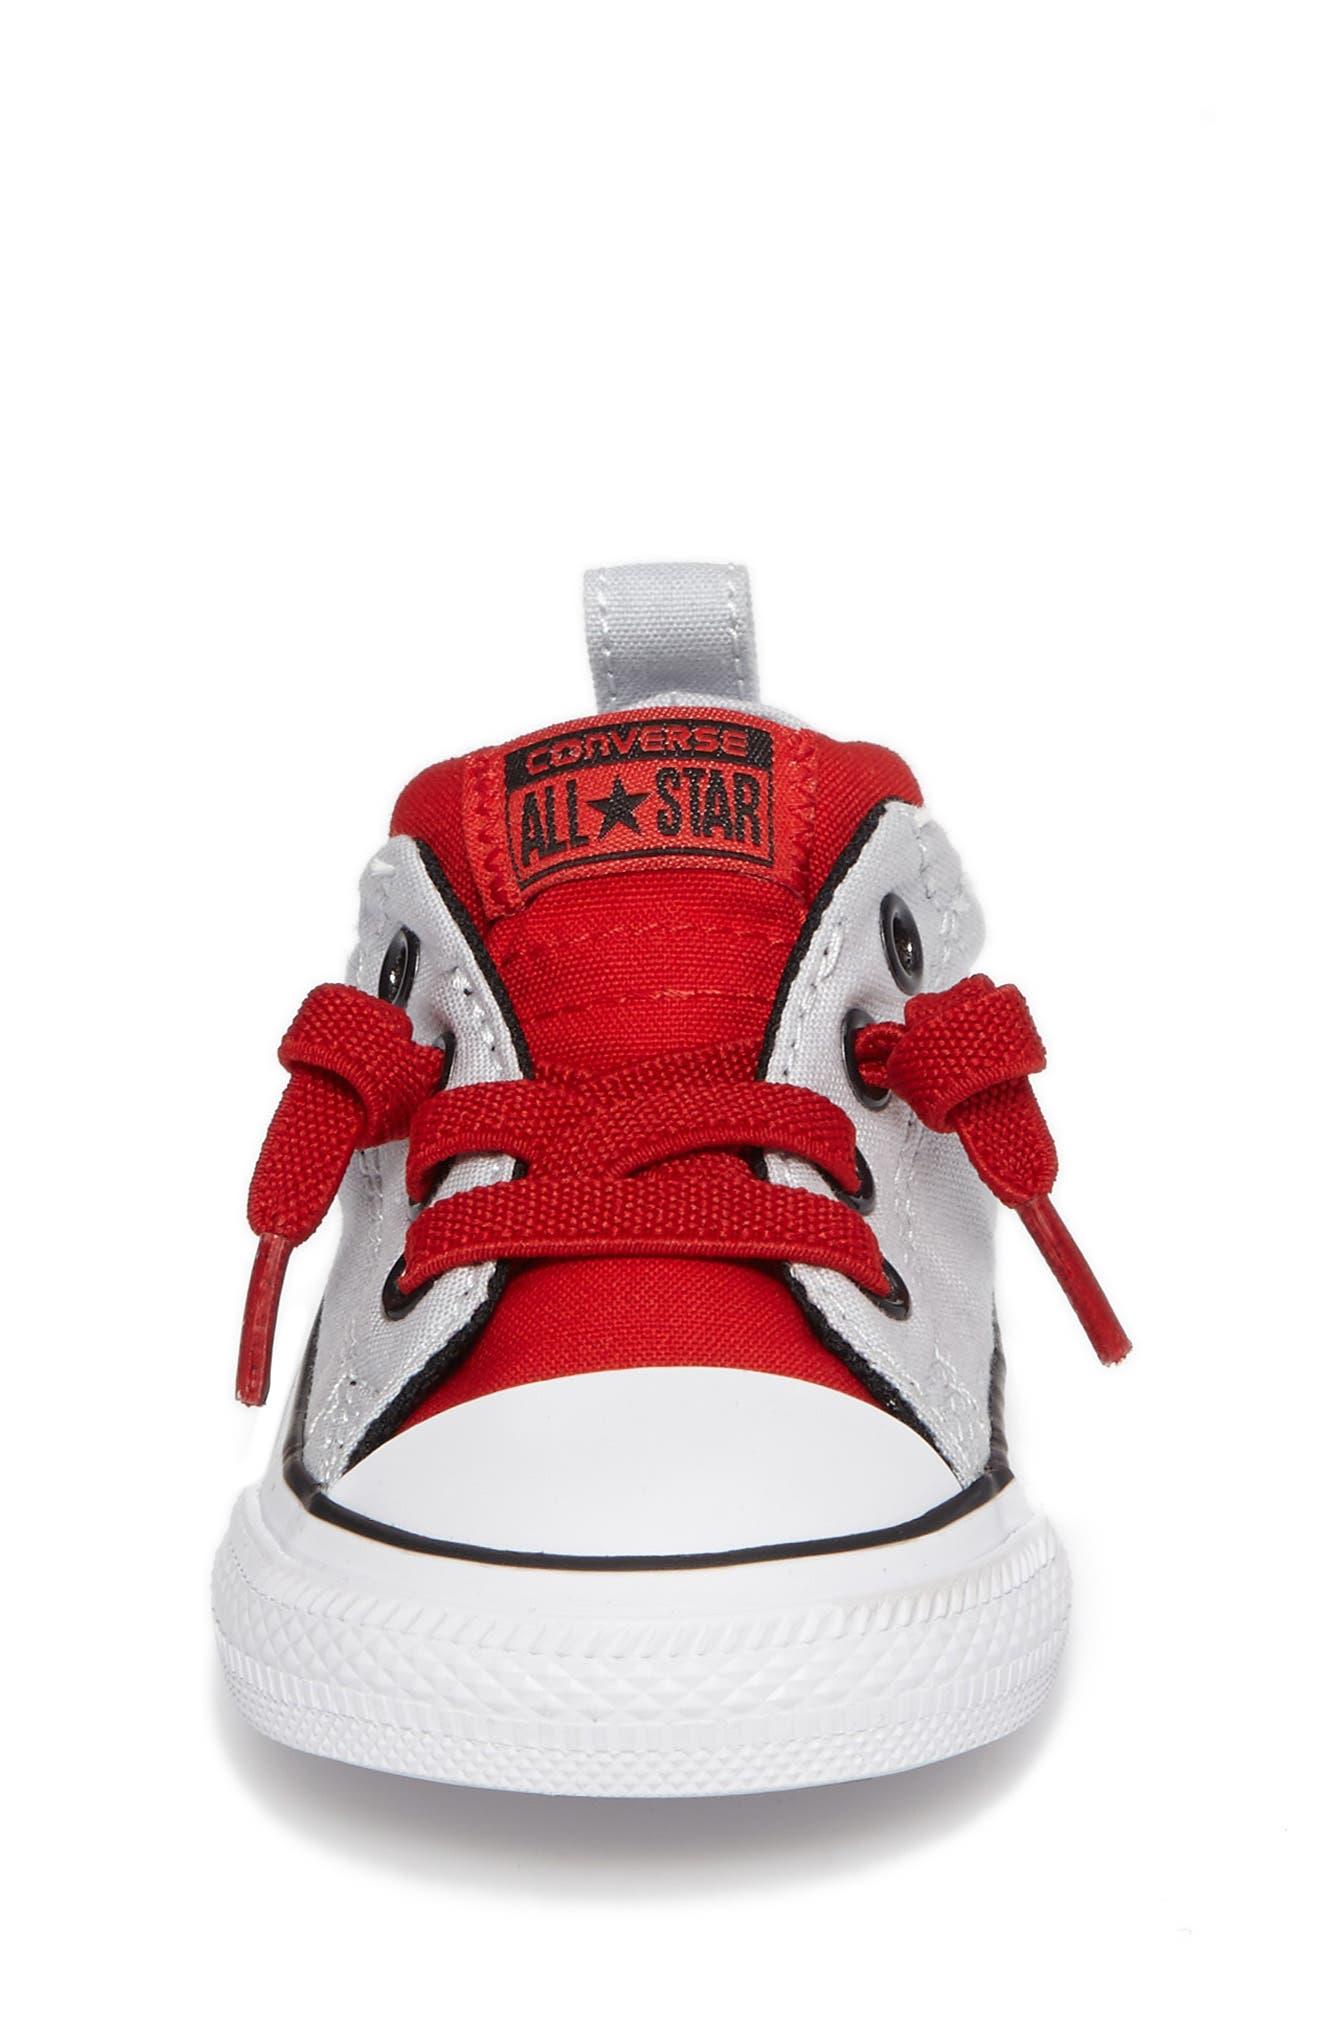 All Star<sup>®</sup> Street Slip Low Top Sneaker,                             Alternate thumbnail 4, color,                             040